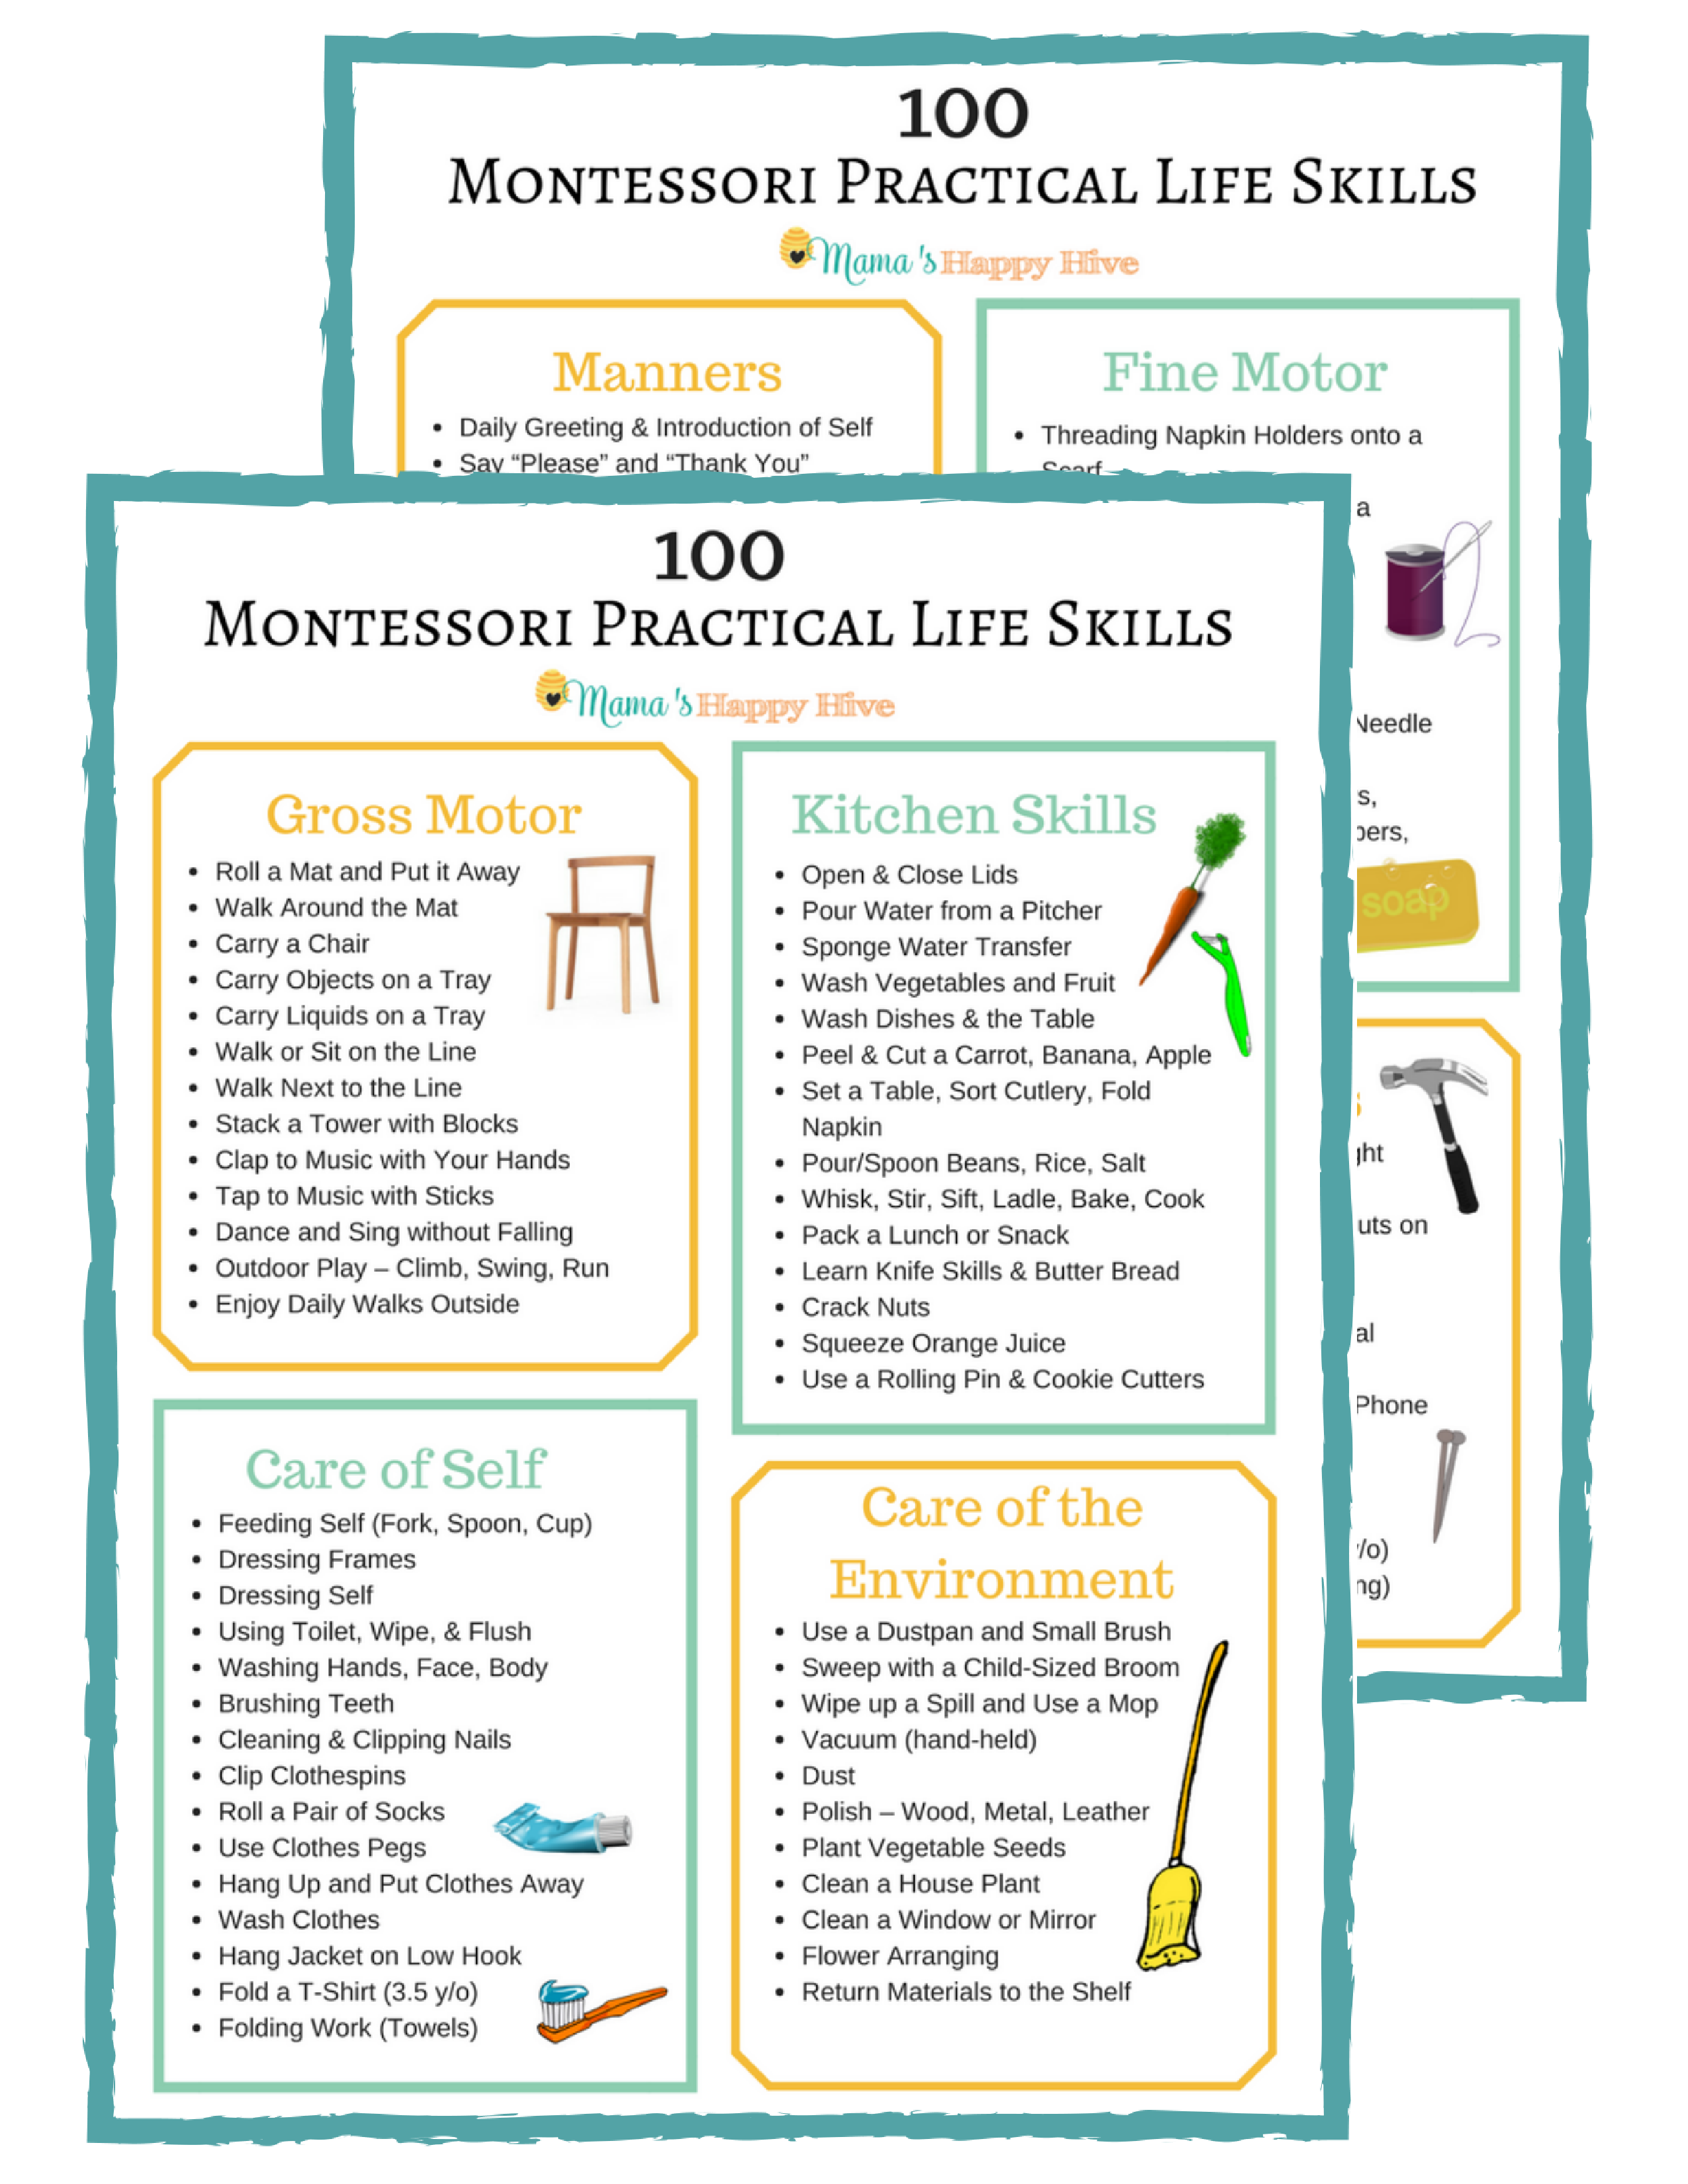 100 Montessori Practical Life Skills